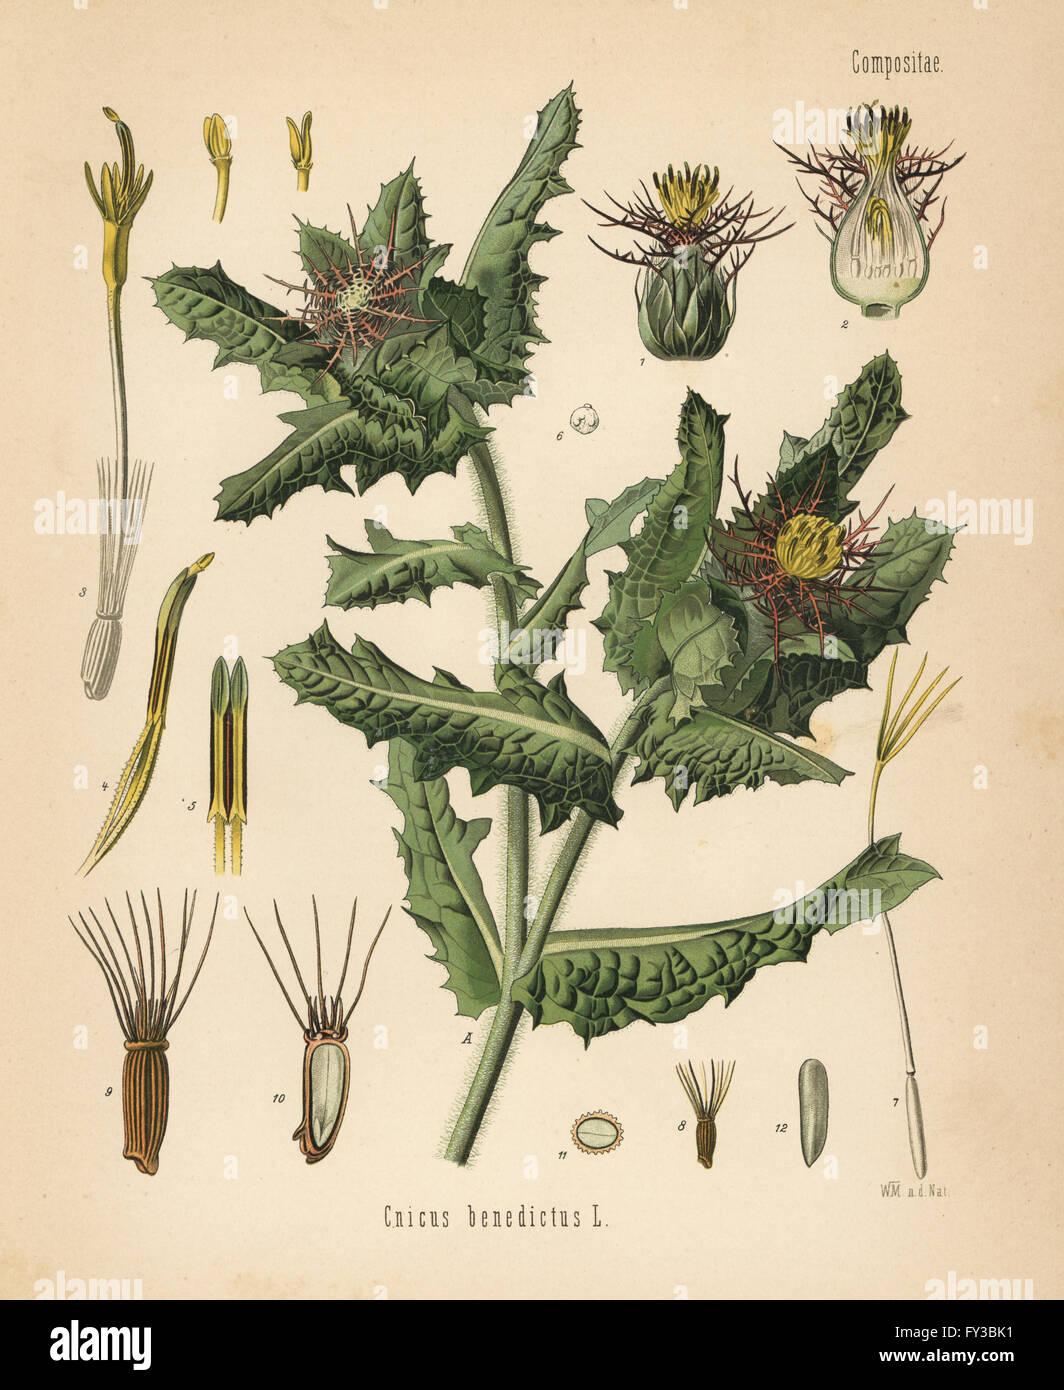 St. Benedict's thistle, Centaurea benedicta (Cnicus benedictus). Chromolithograph after a botanical illustration - Stock Image